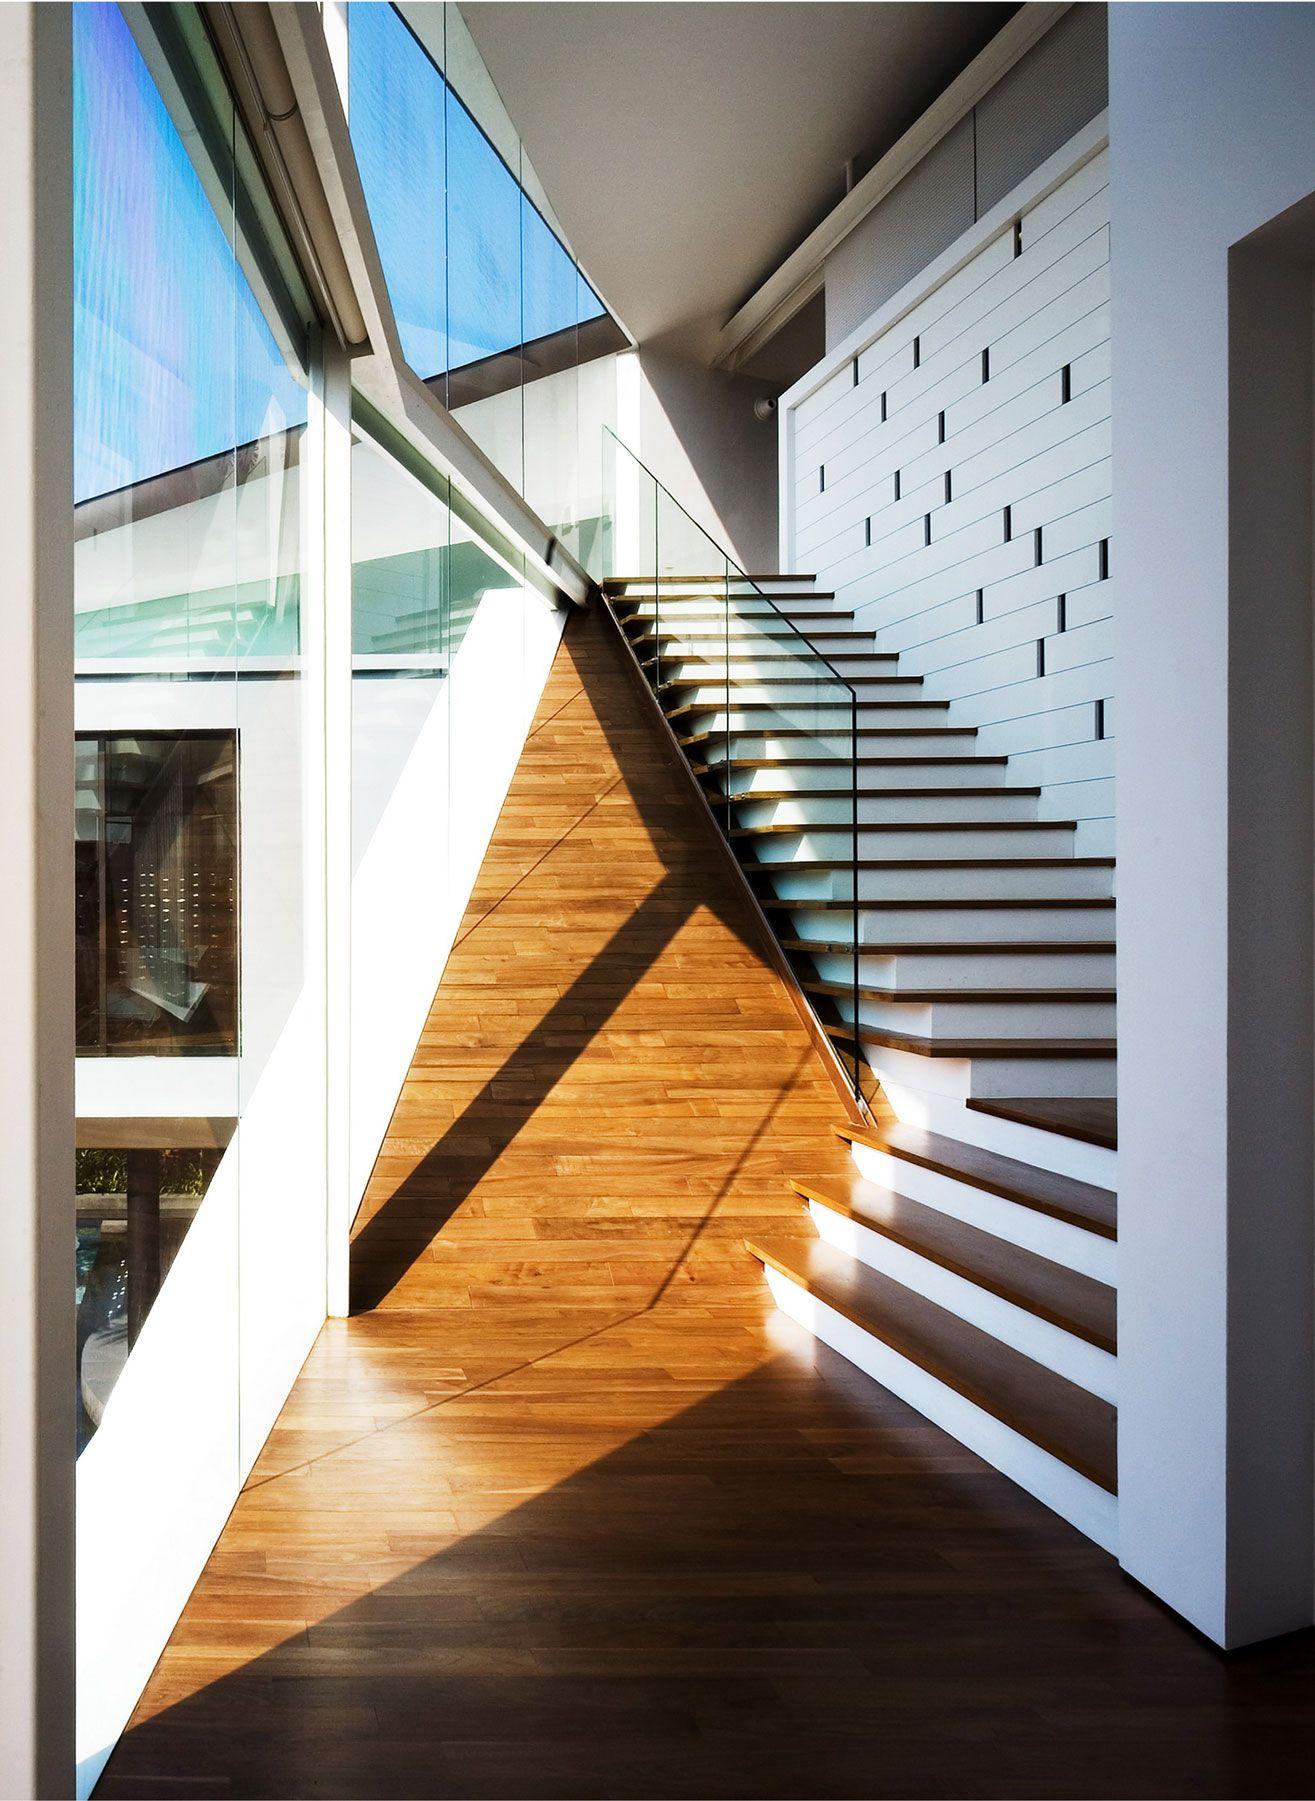 Origami Architecture Design Origami House Formwerkz Architects Caandesign Architecture